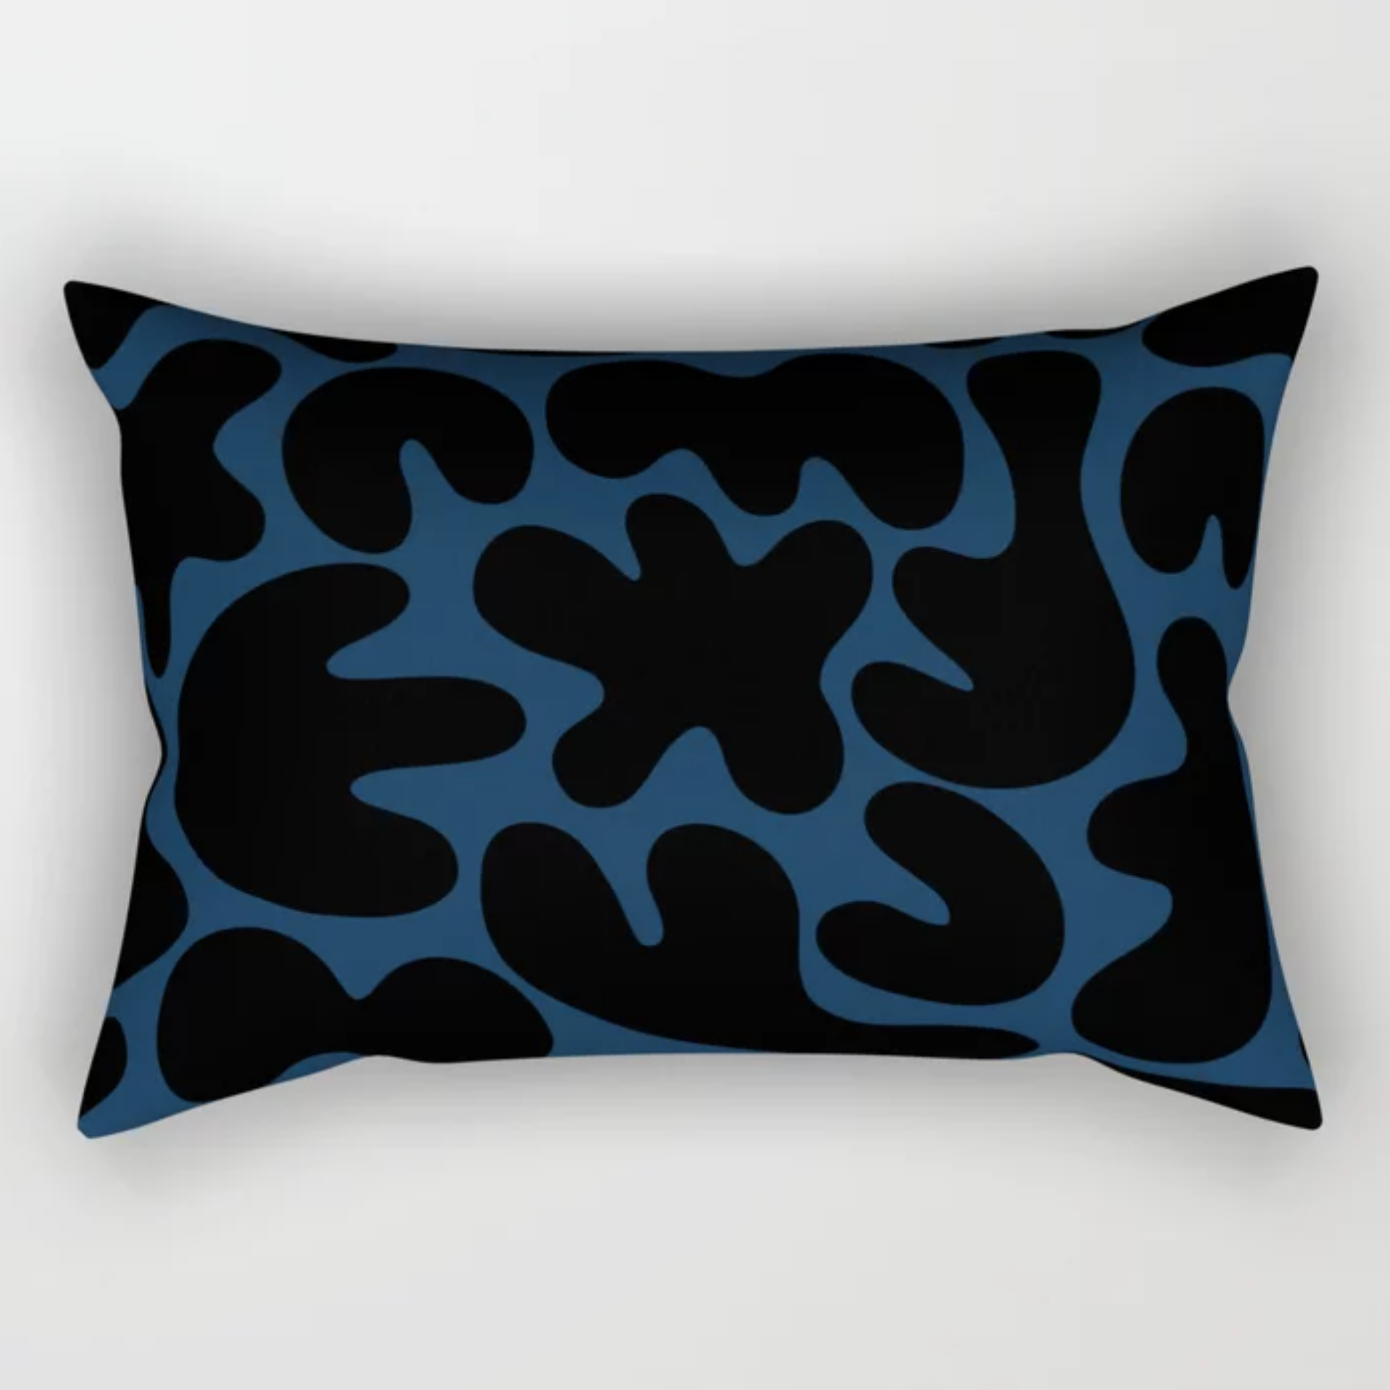 Blob Collage Navy Rectangle Throw Pillow